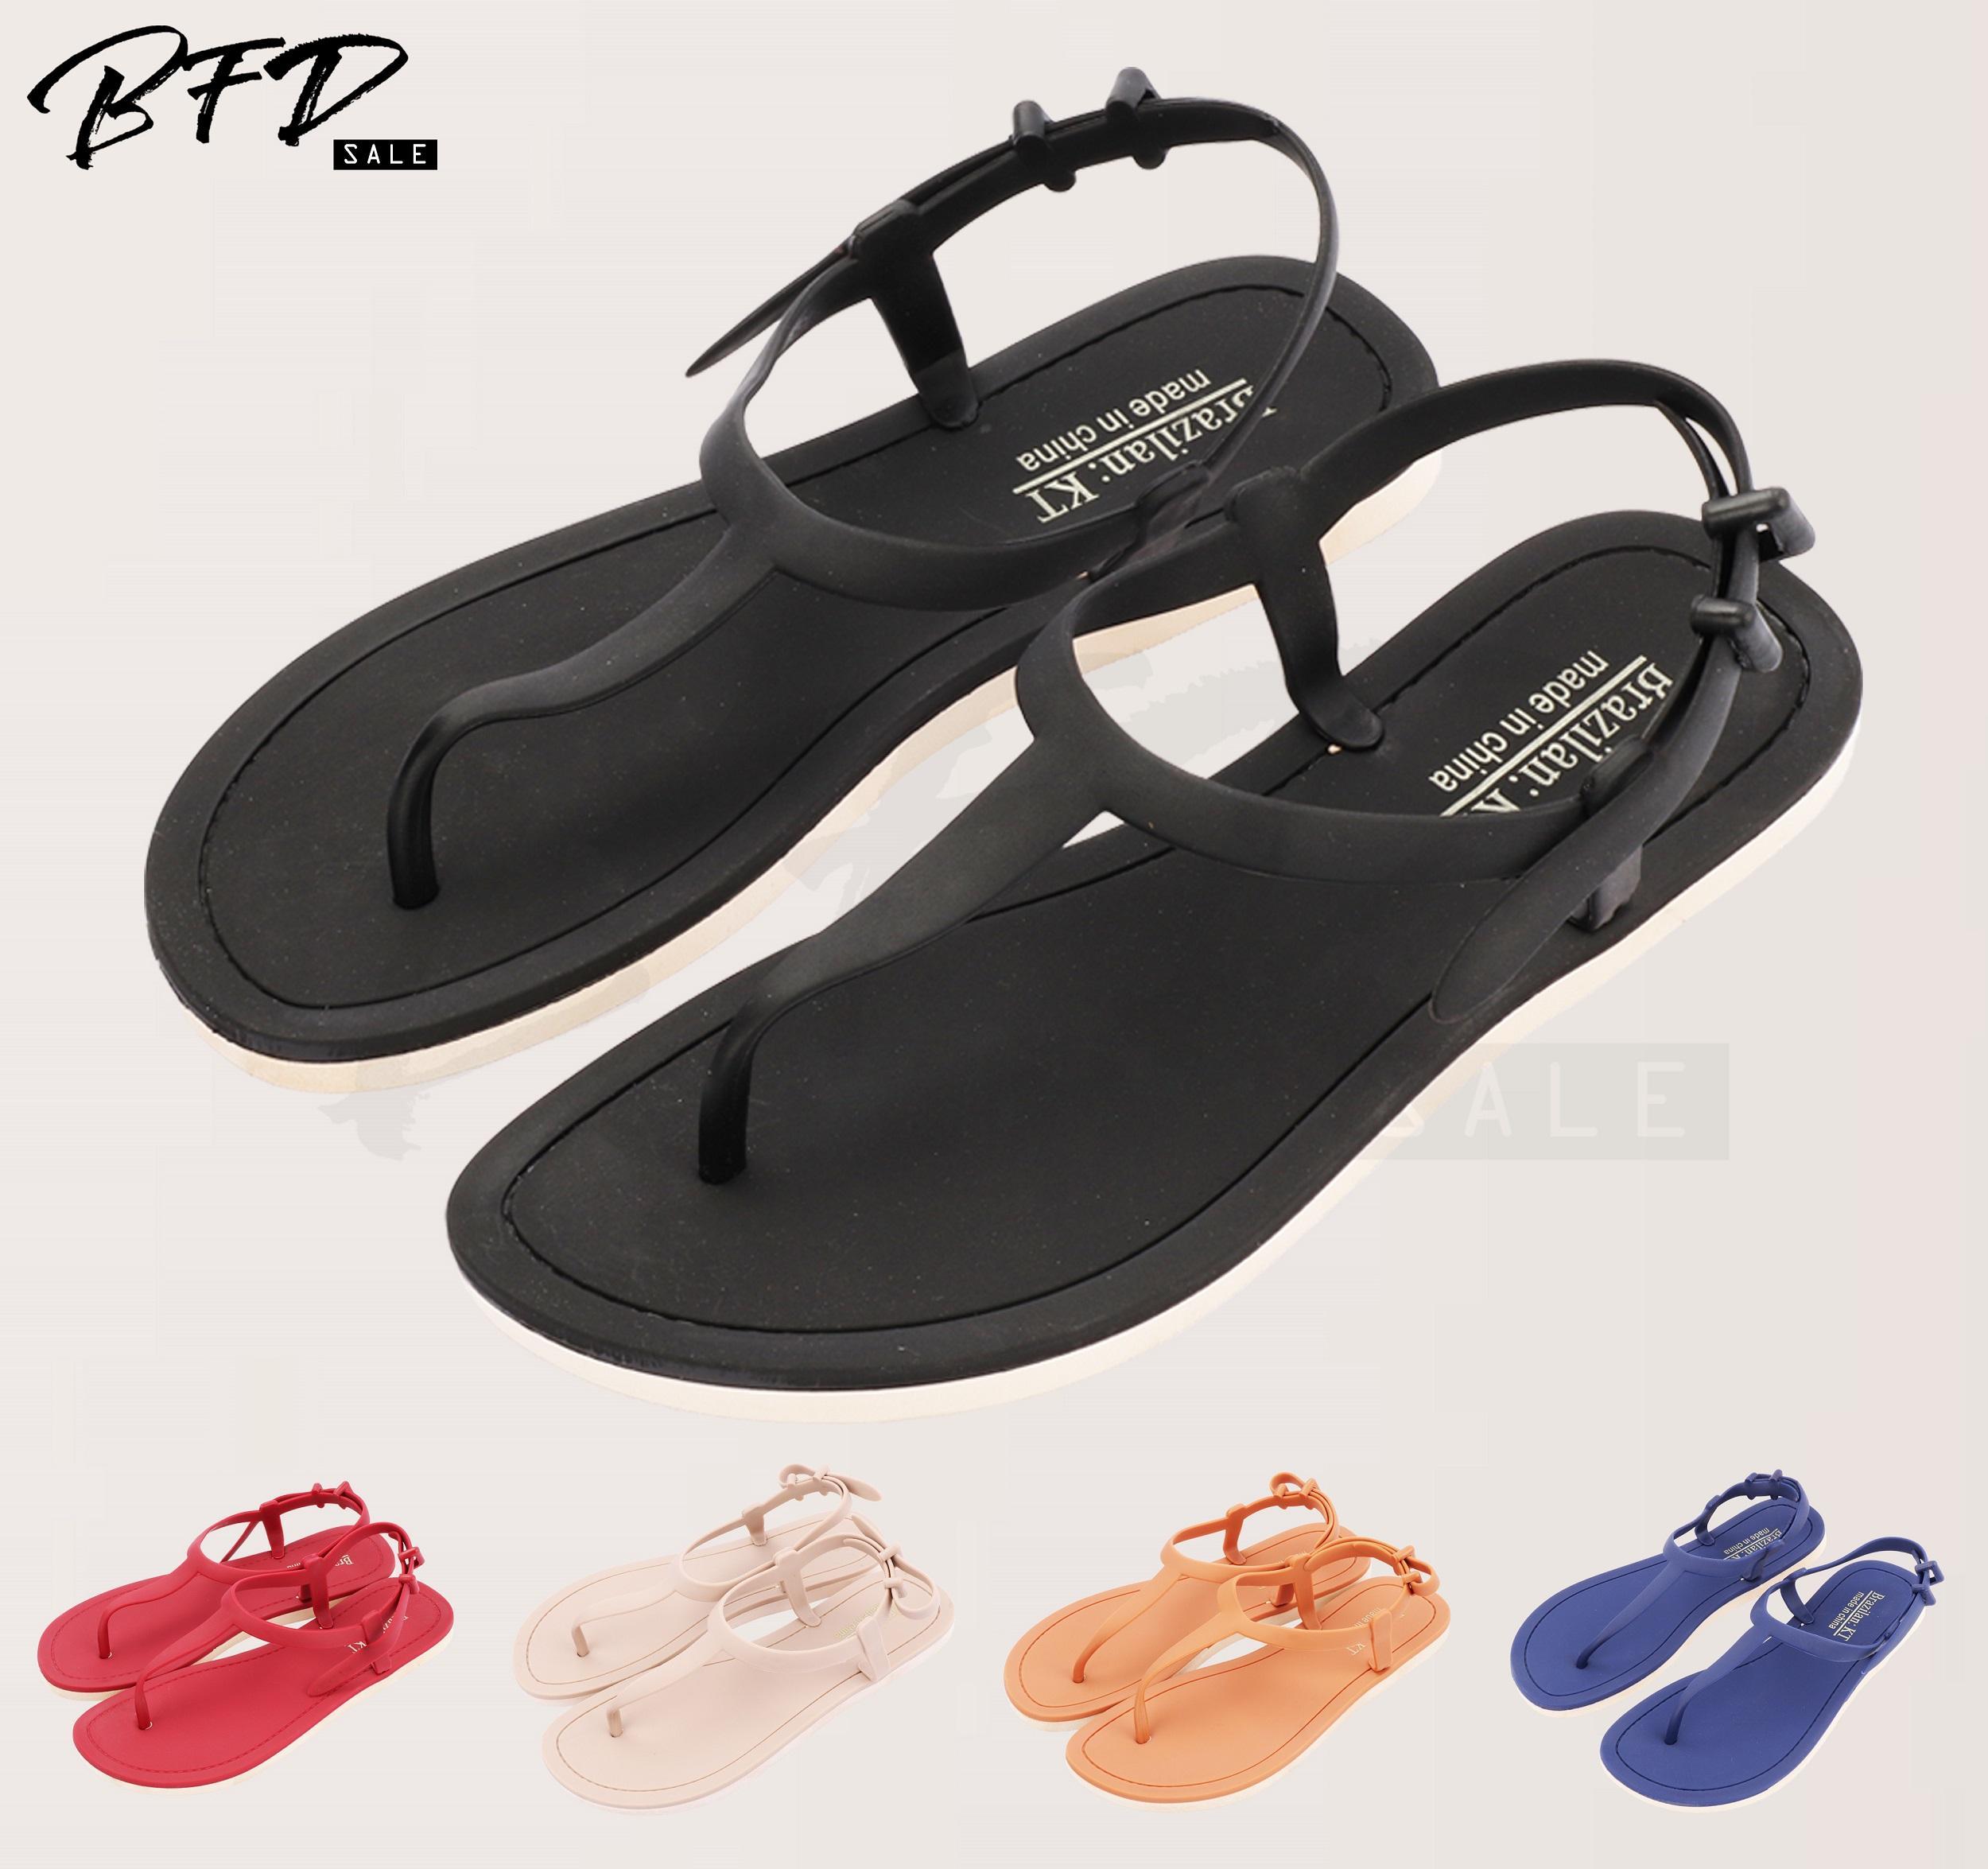 aabdc53f7f4f Big Sale Korean Style Ladies Flat Sandals Elastic Band Closure T-Strap  Sandals 8839